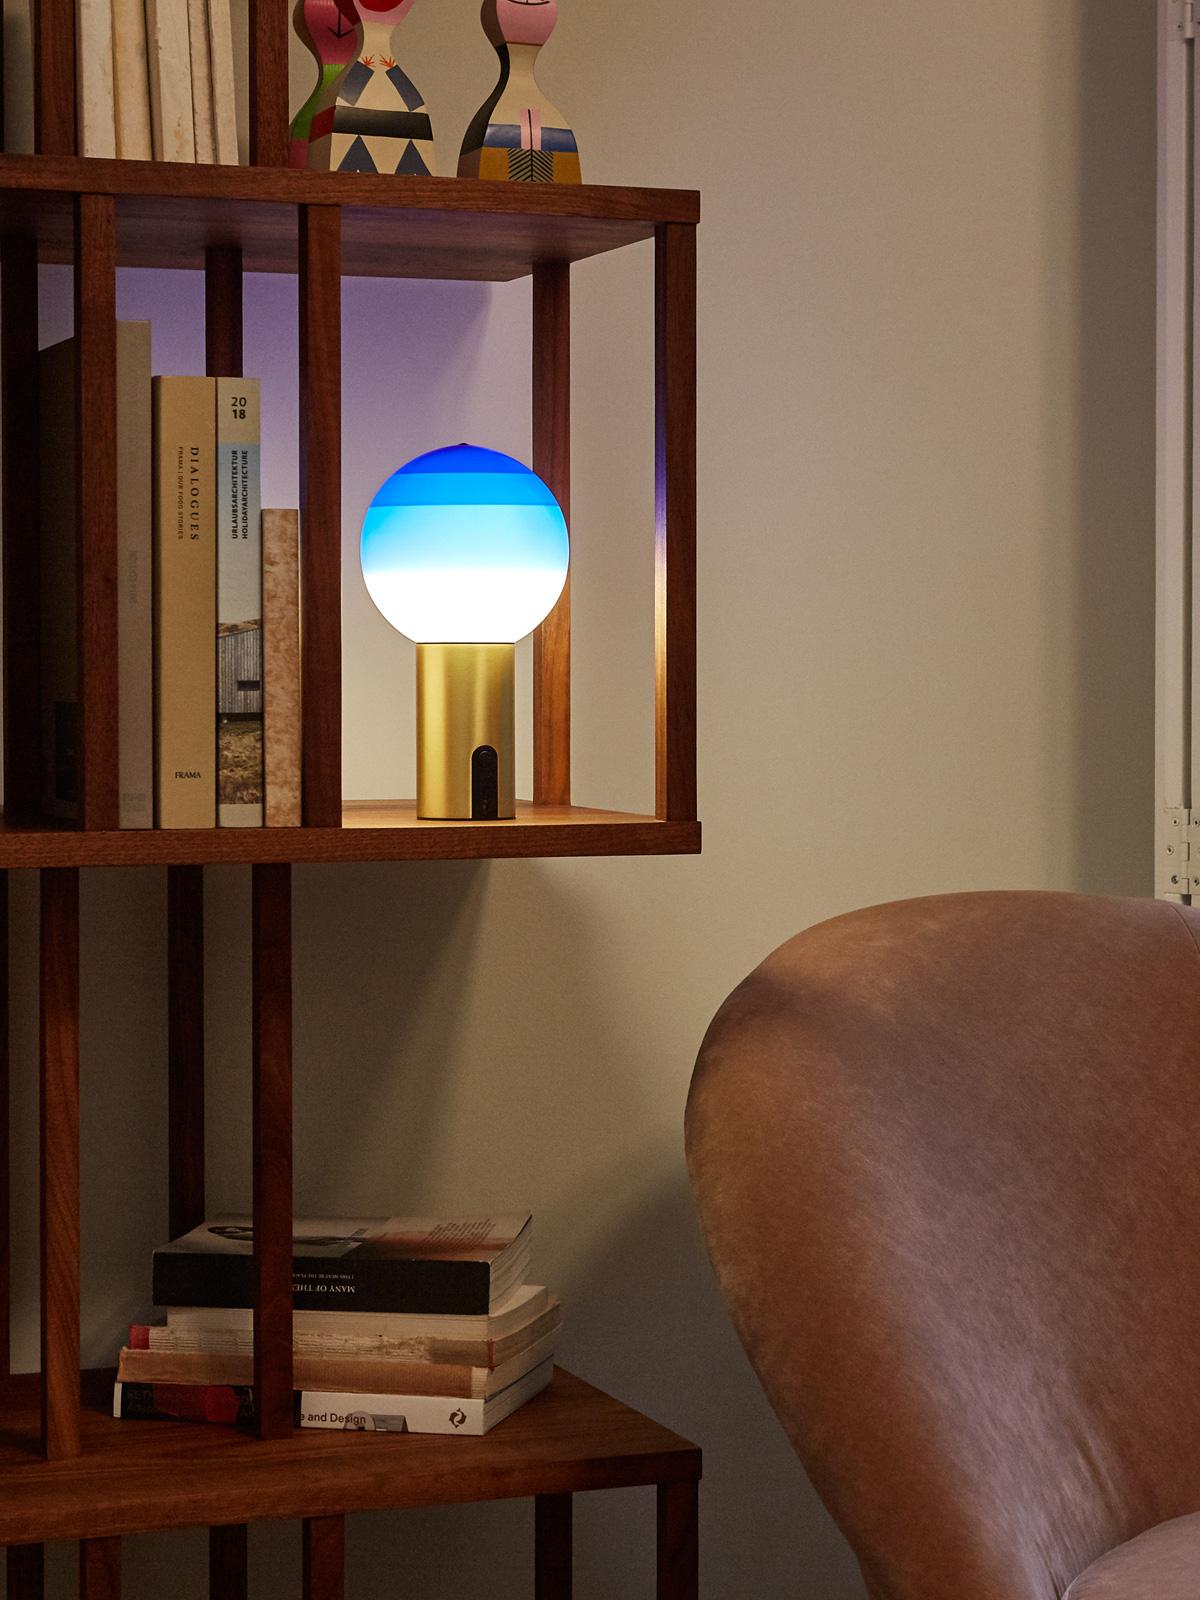 Dipping Light Portable Marset tragbare Akkuleuchte in buntem Glas DesignOrt Onlineshop Lampen Designerleuchten Berlin